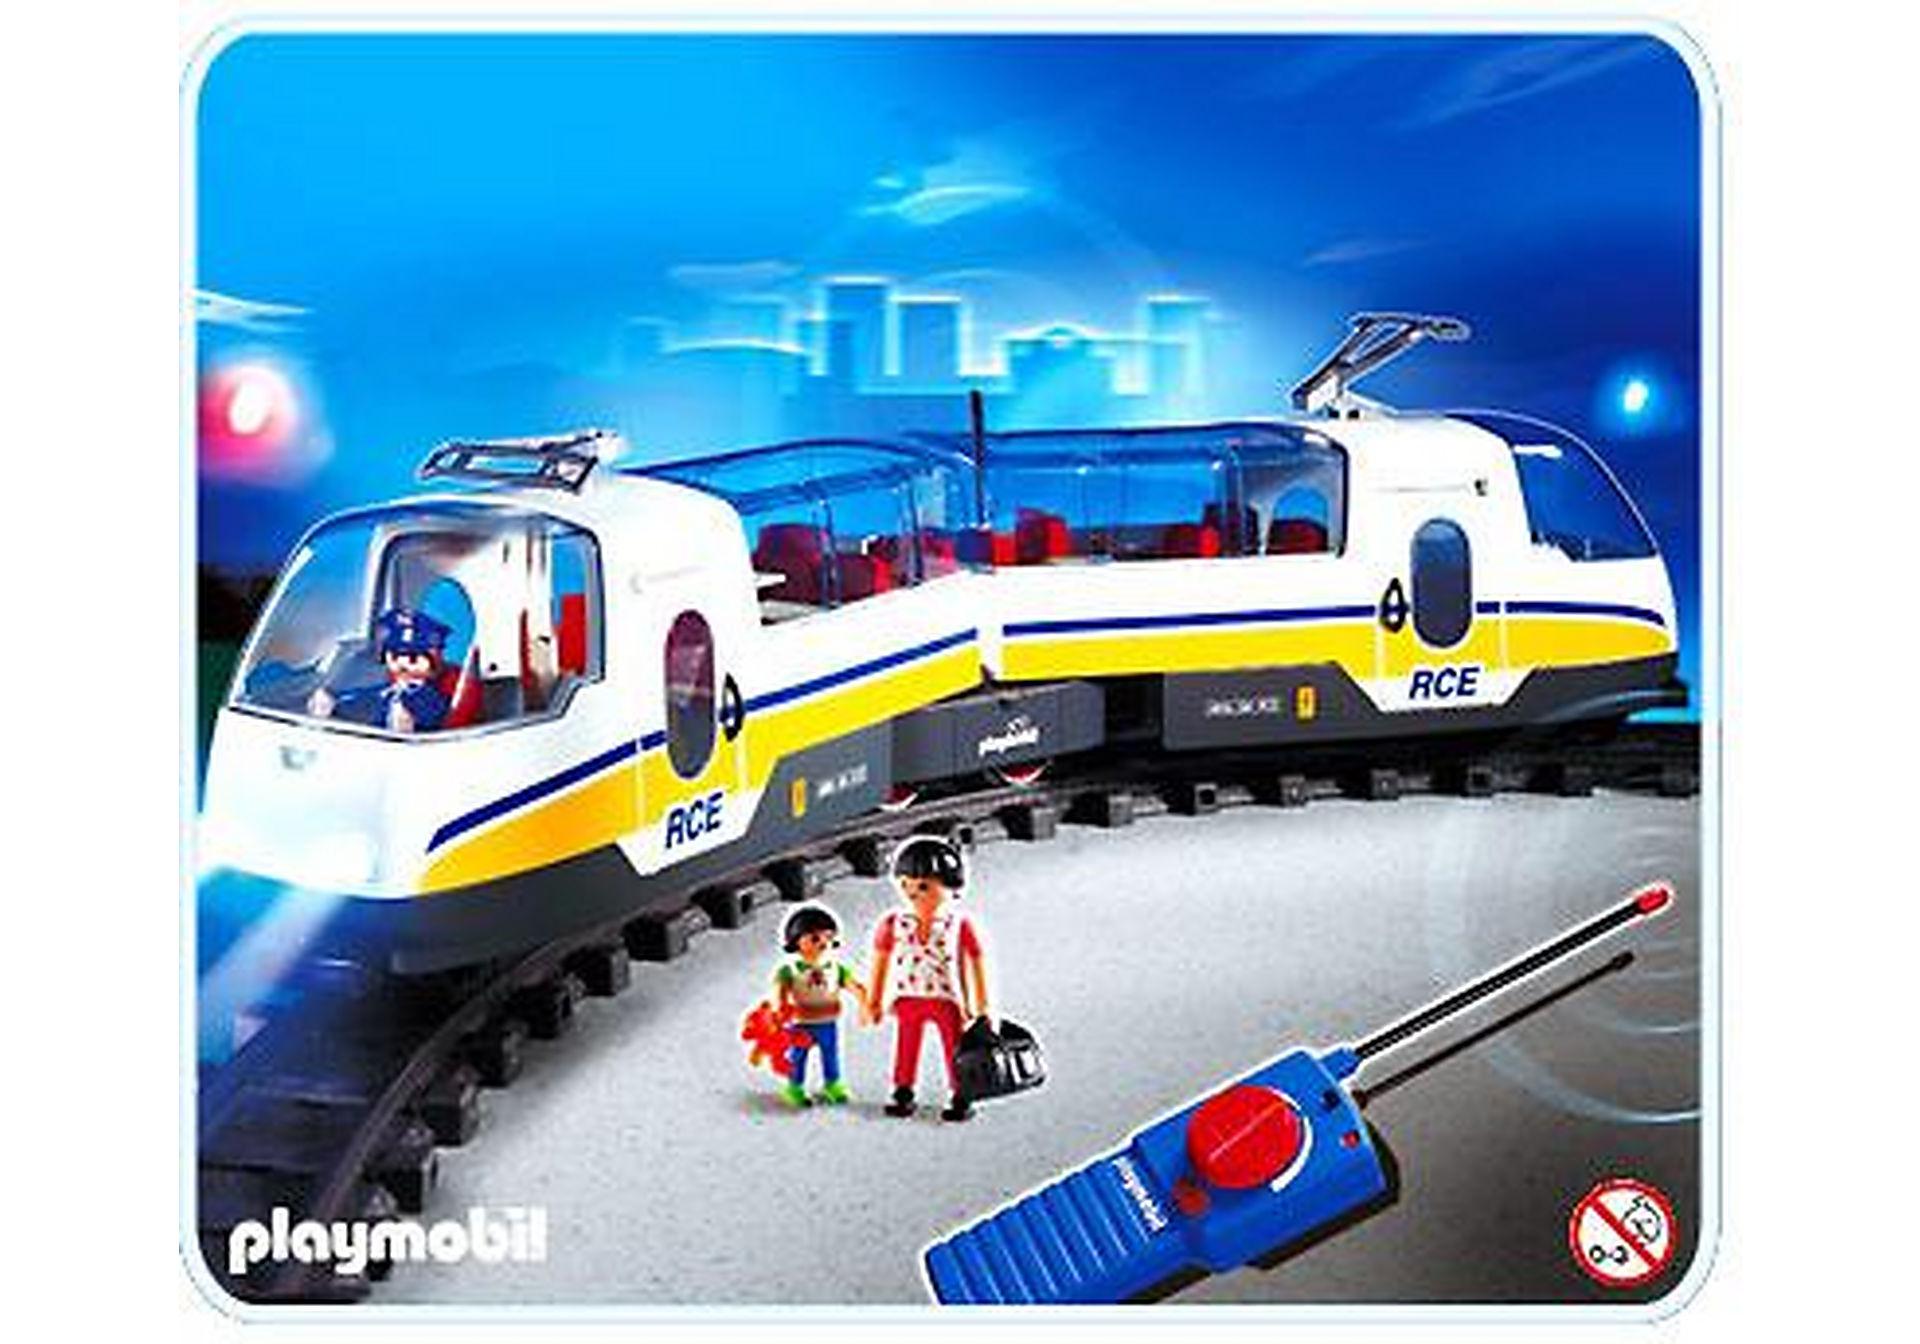 http://media.playmobil.com/i/playmobil/4011-A_product_detail/RCE mit Licht